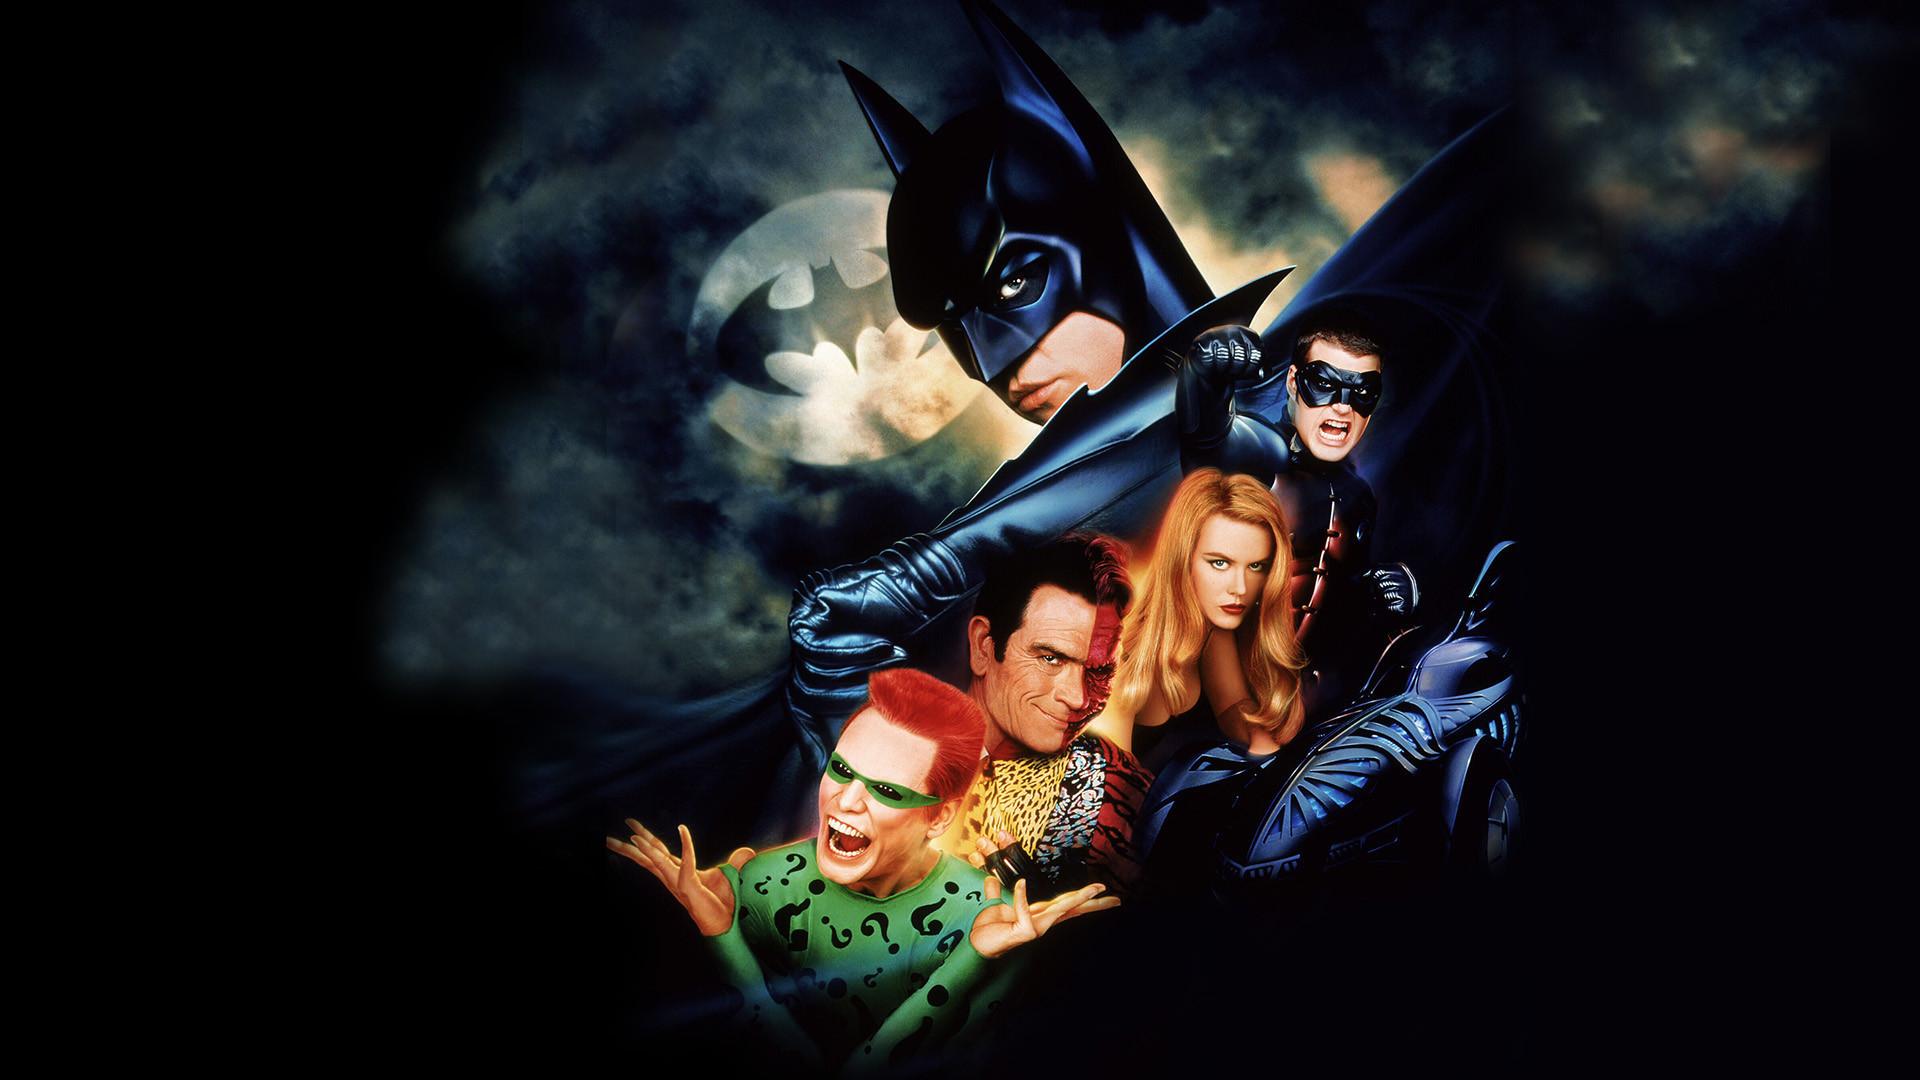 7 weird and wonderful Science Fiction and Fantasy Fan Theories – Batman  Forever/Batman & Robin exist in the Burton Batverse